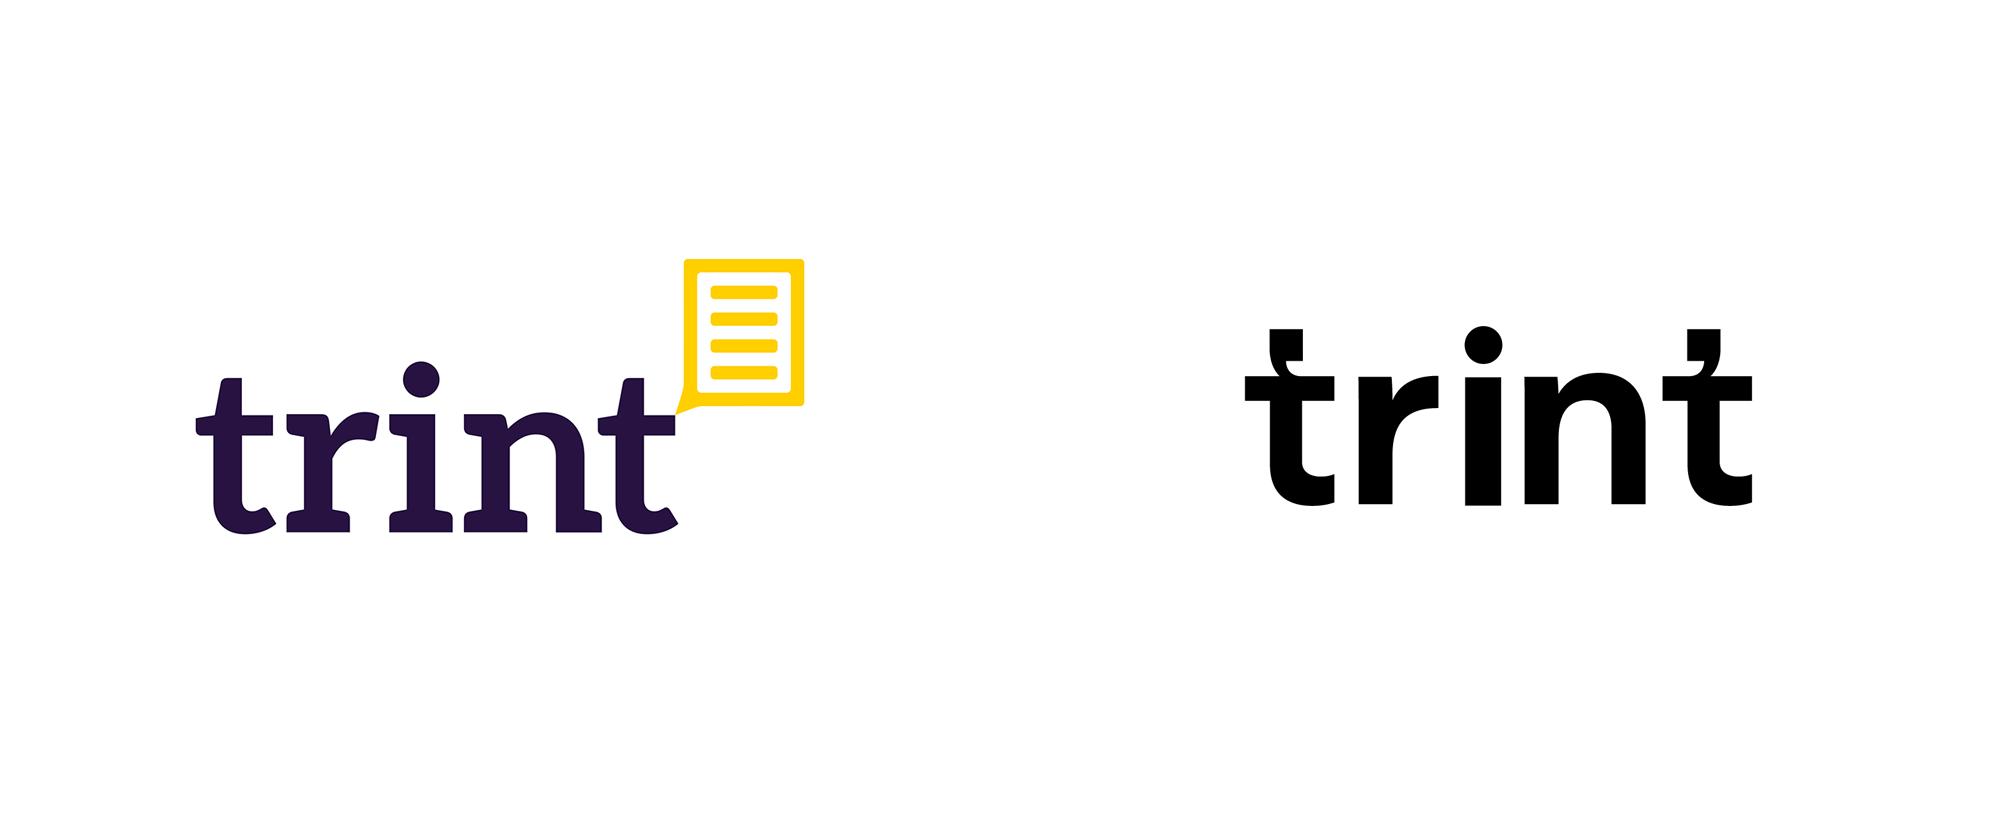 New Logo for Trint by Studio Lovelock